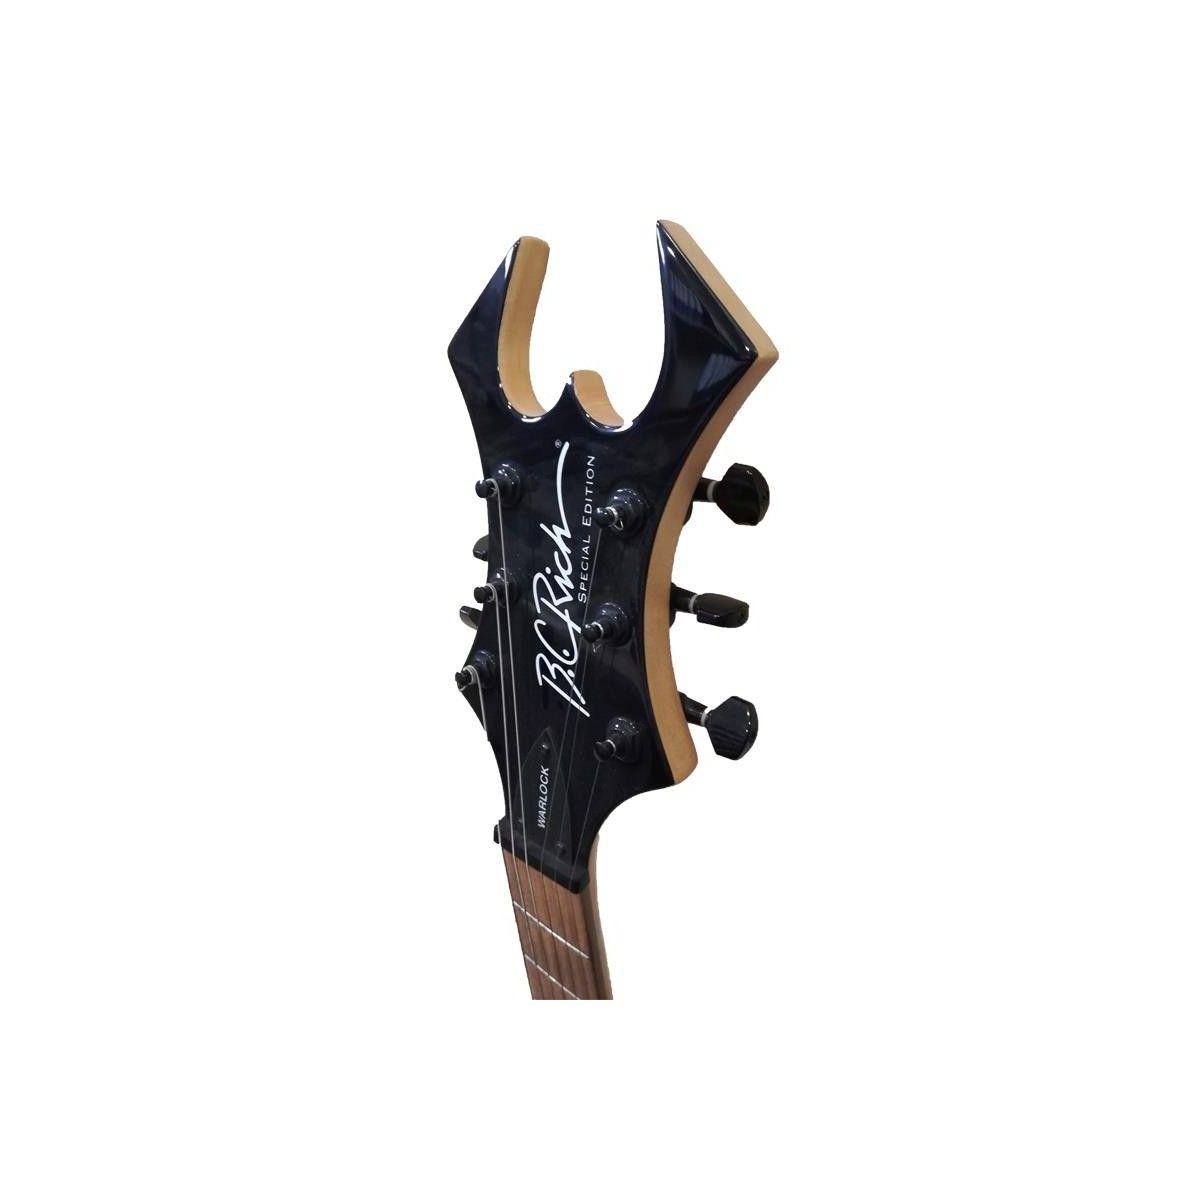 Guitarra Electrica Bc Rich Warlock Platinum Onix Klavier